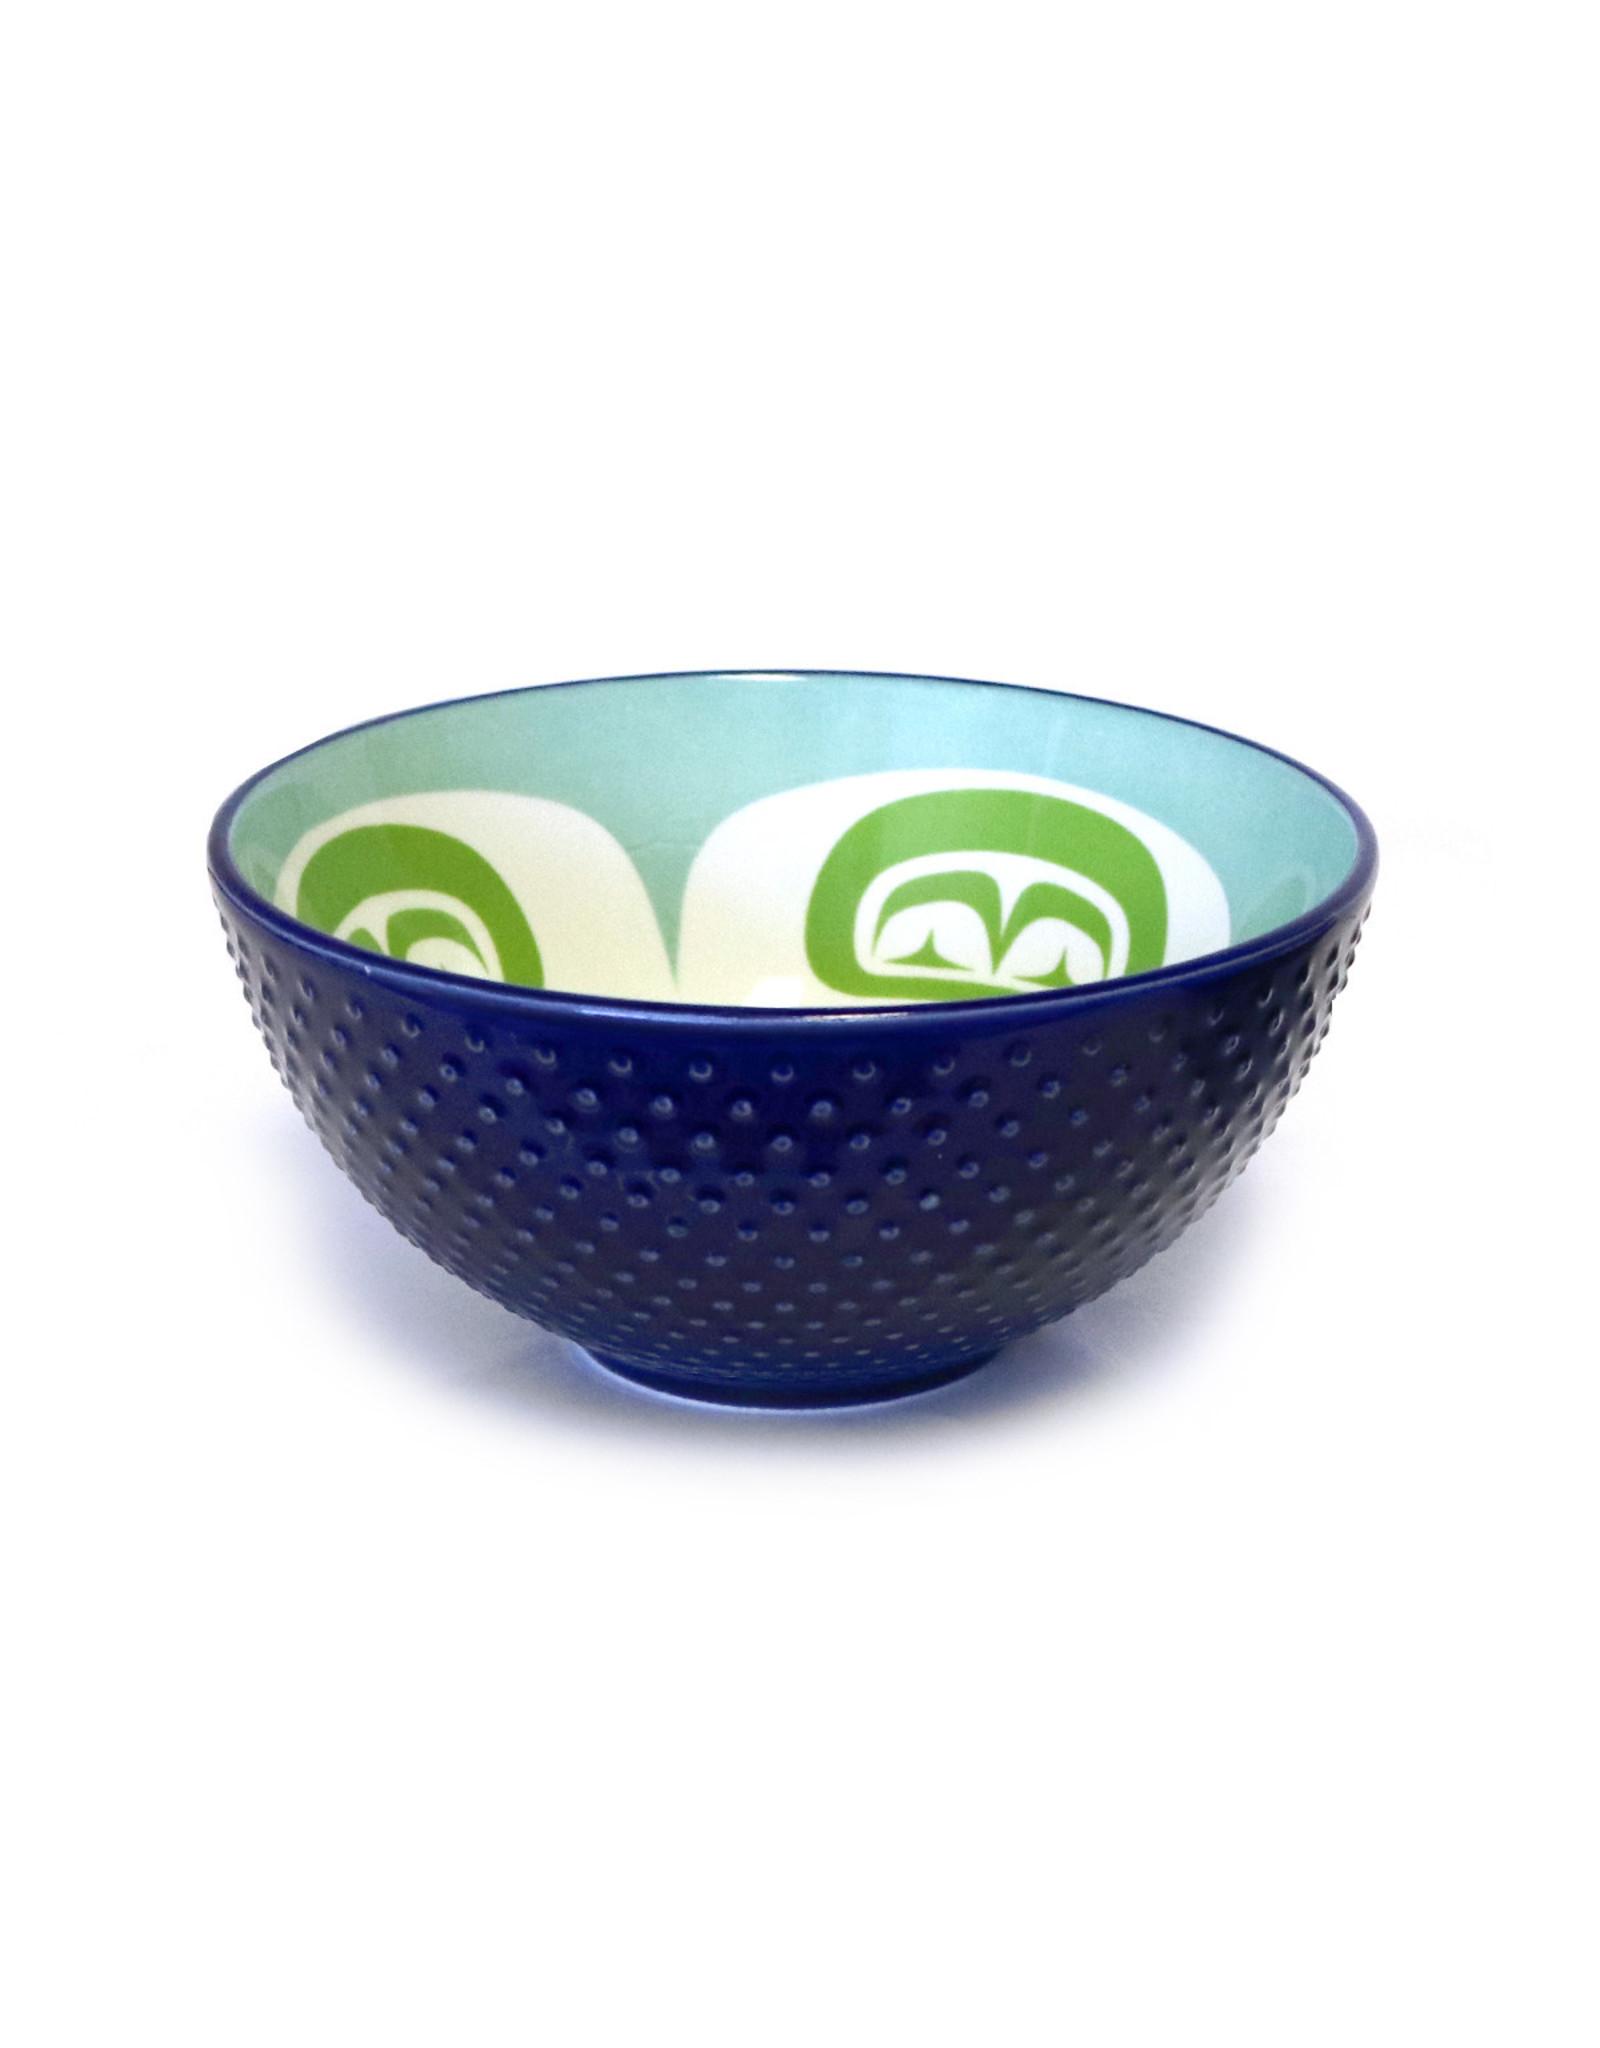 Medium Art Bowl - Moon by Simone Diamond (BOWLM15)